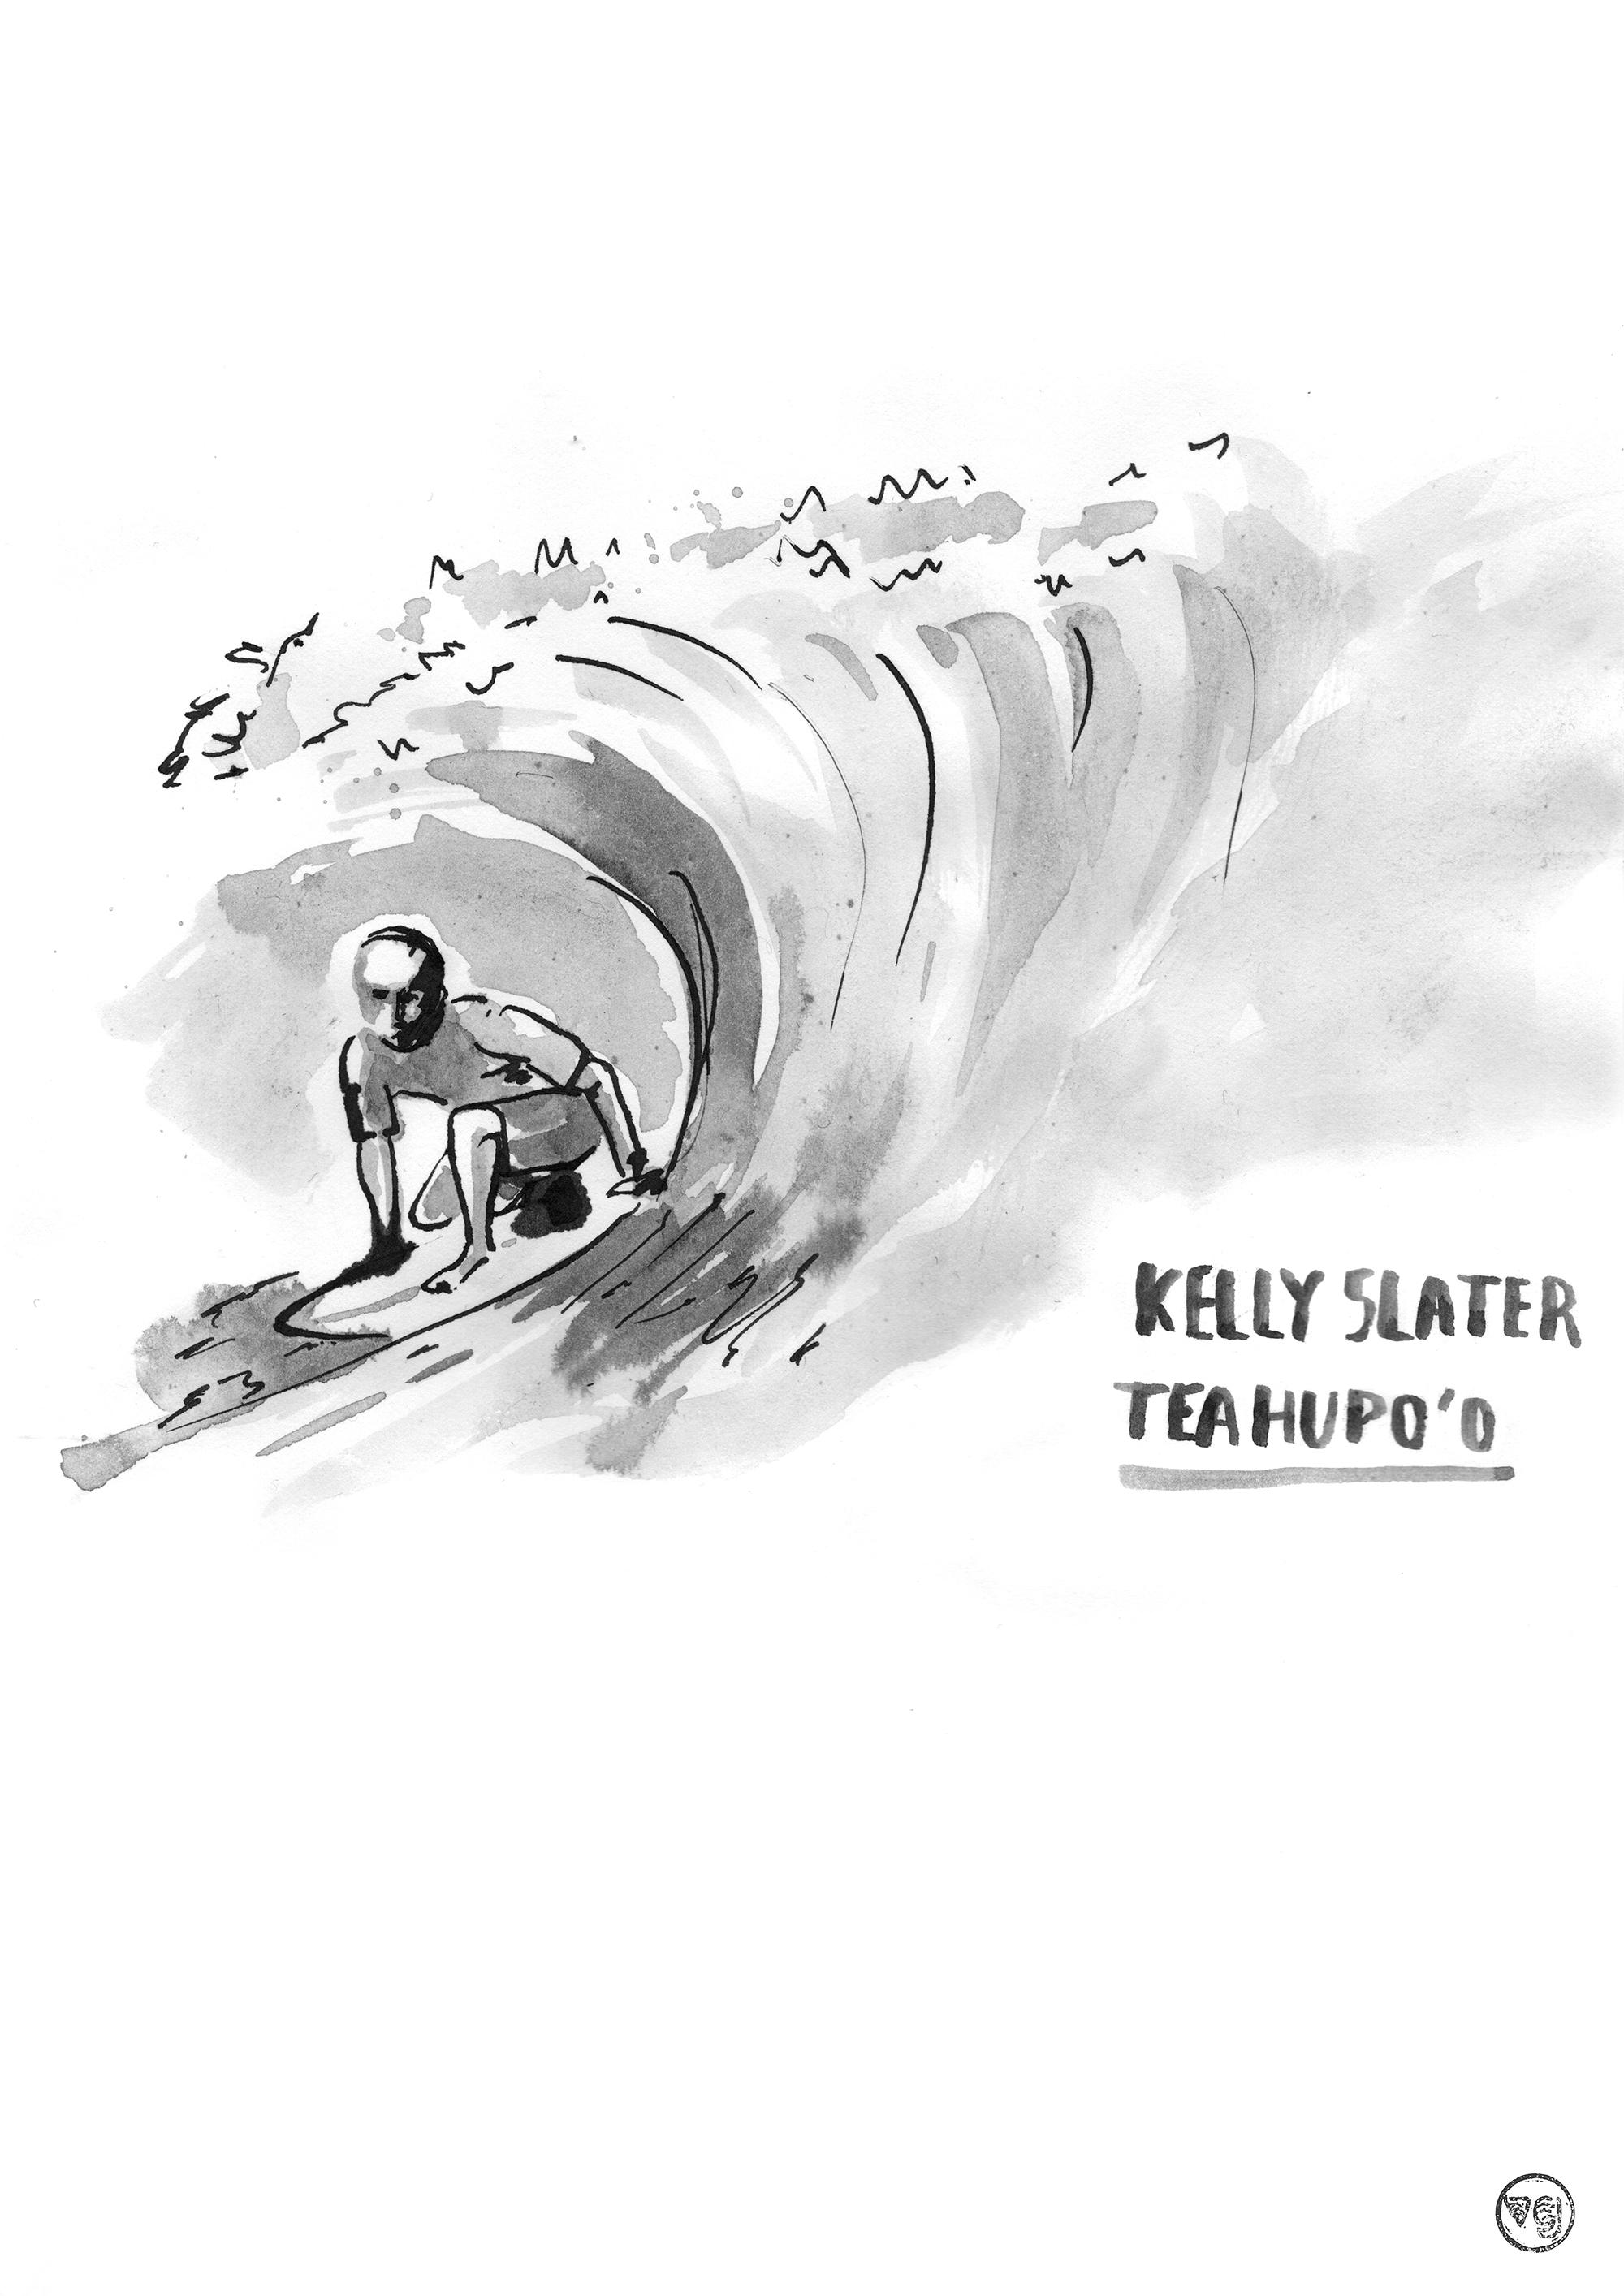 Kelly-slater-vaguegraphique-dessins